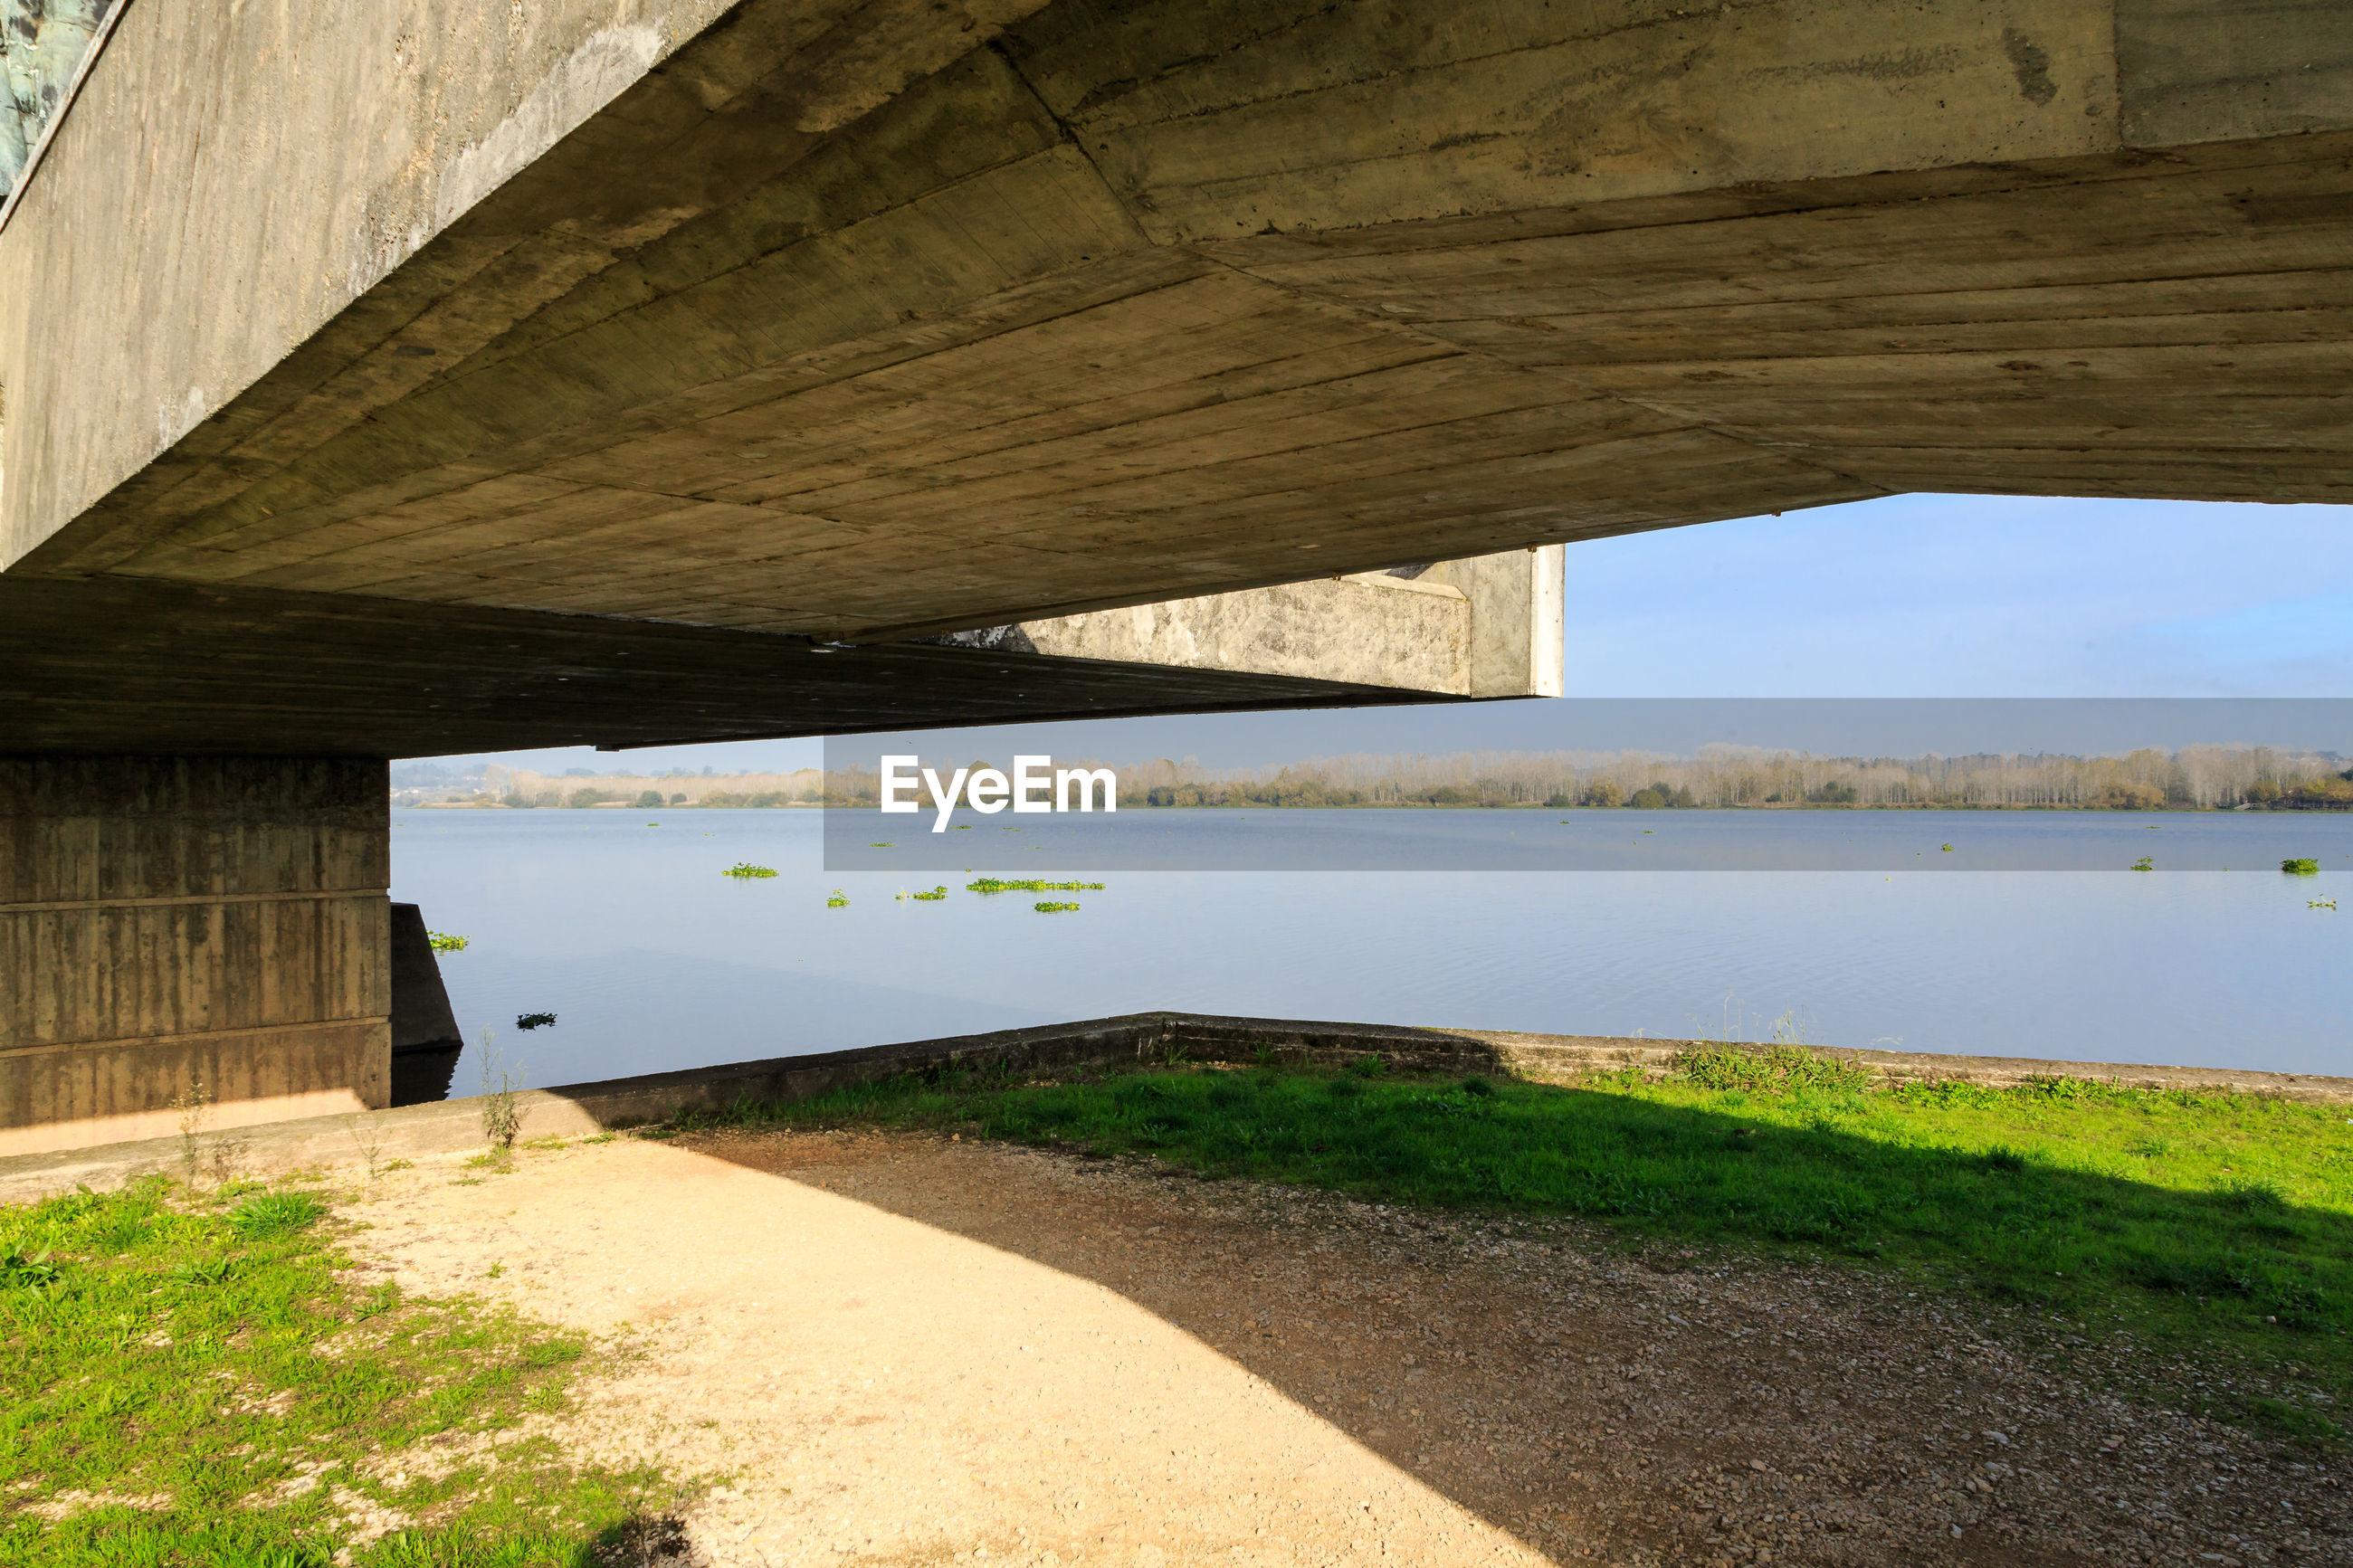 Scenic view of bridge over river against sky